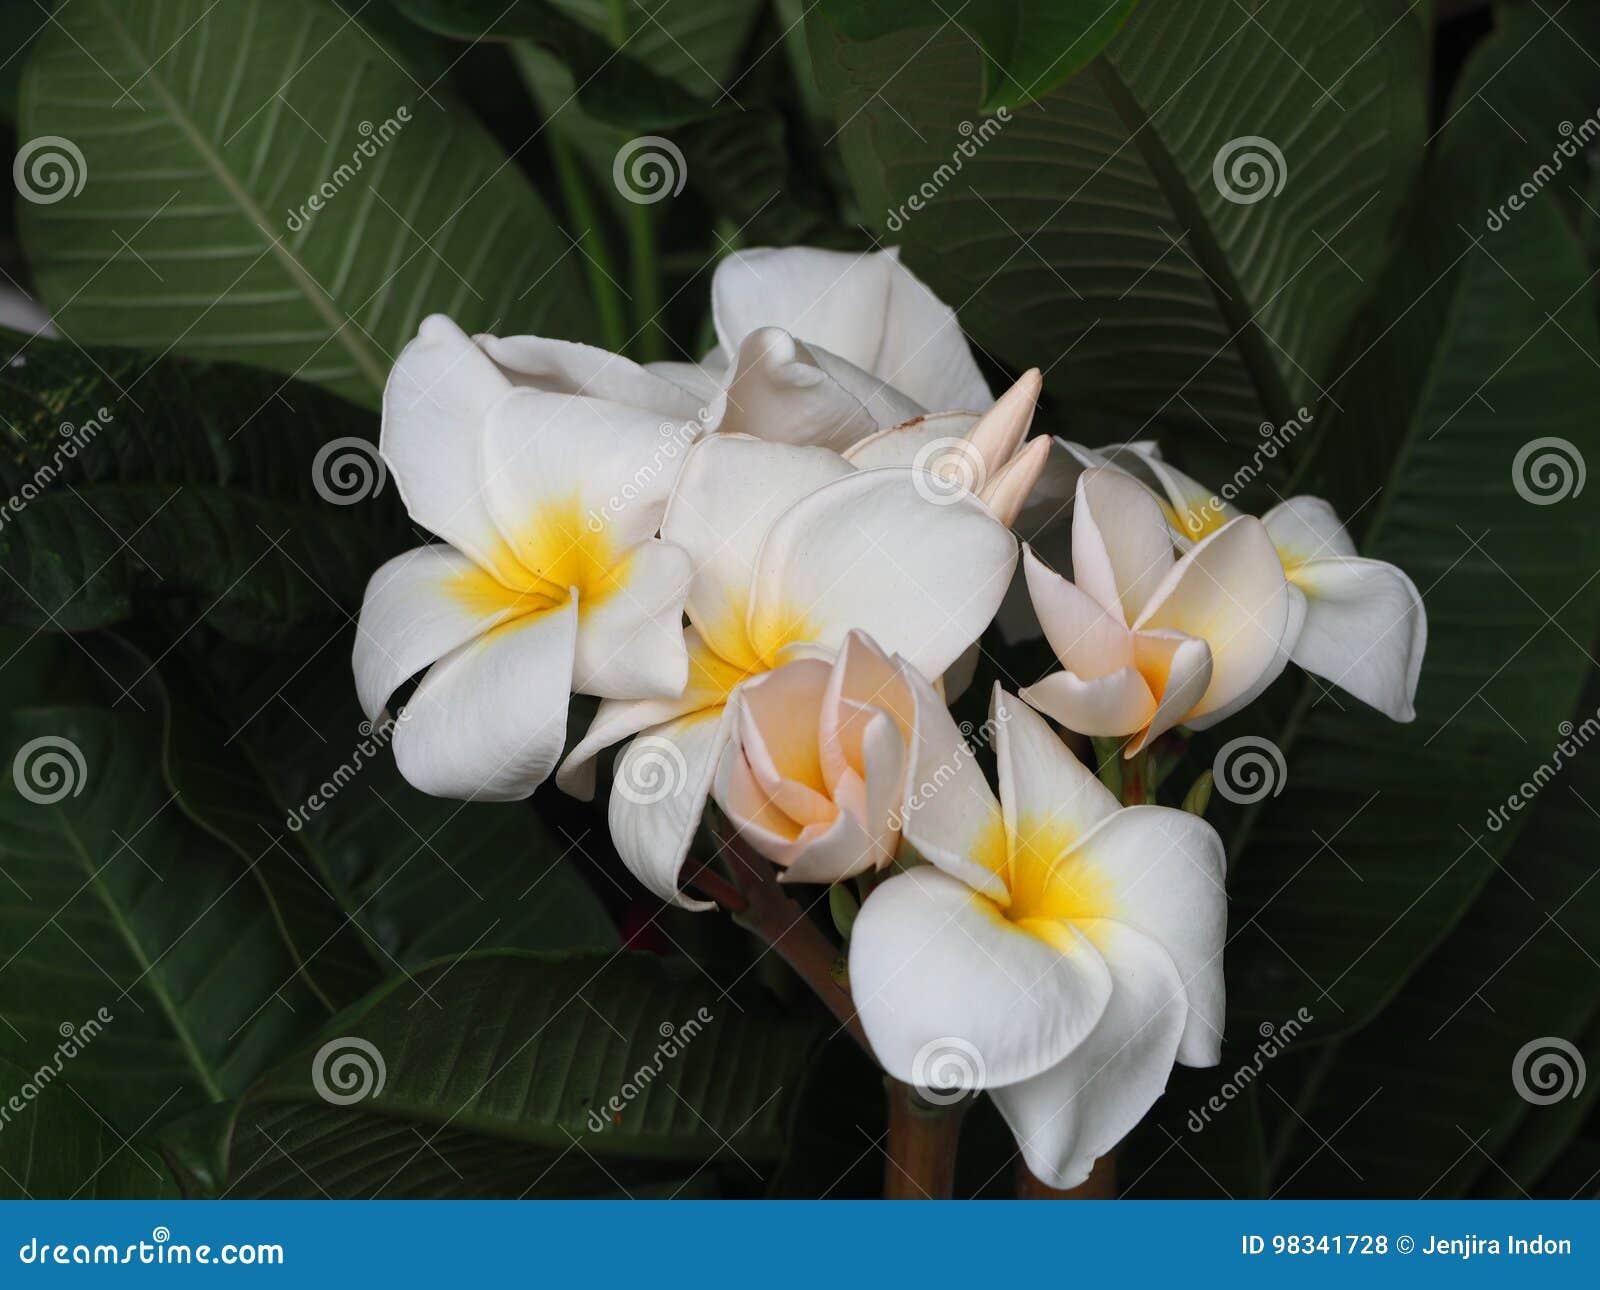 Bouquet of plumeria flowers stock photo image of closeup download bouquet of plumeria flowers stock photo image of closeup hawaiian 98341728 izmirmasajfo